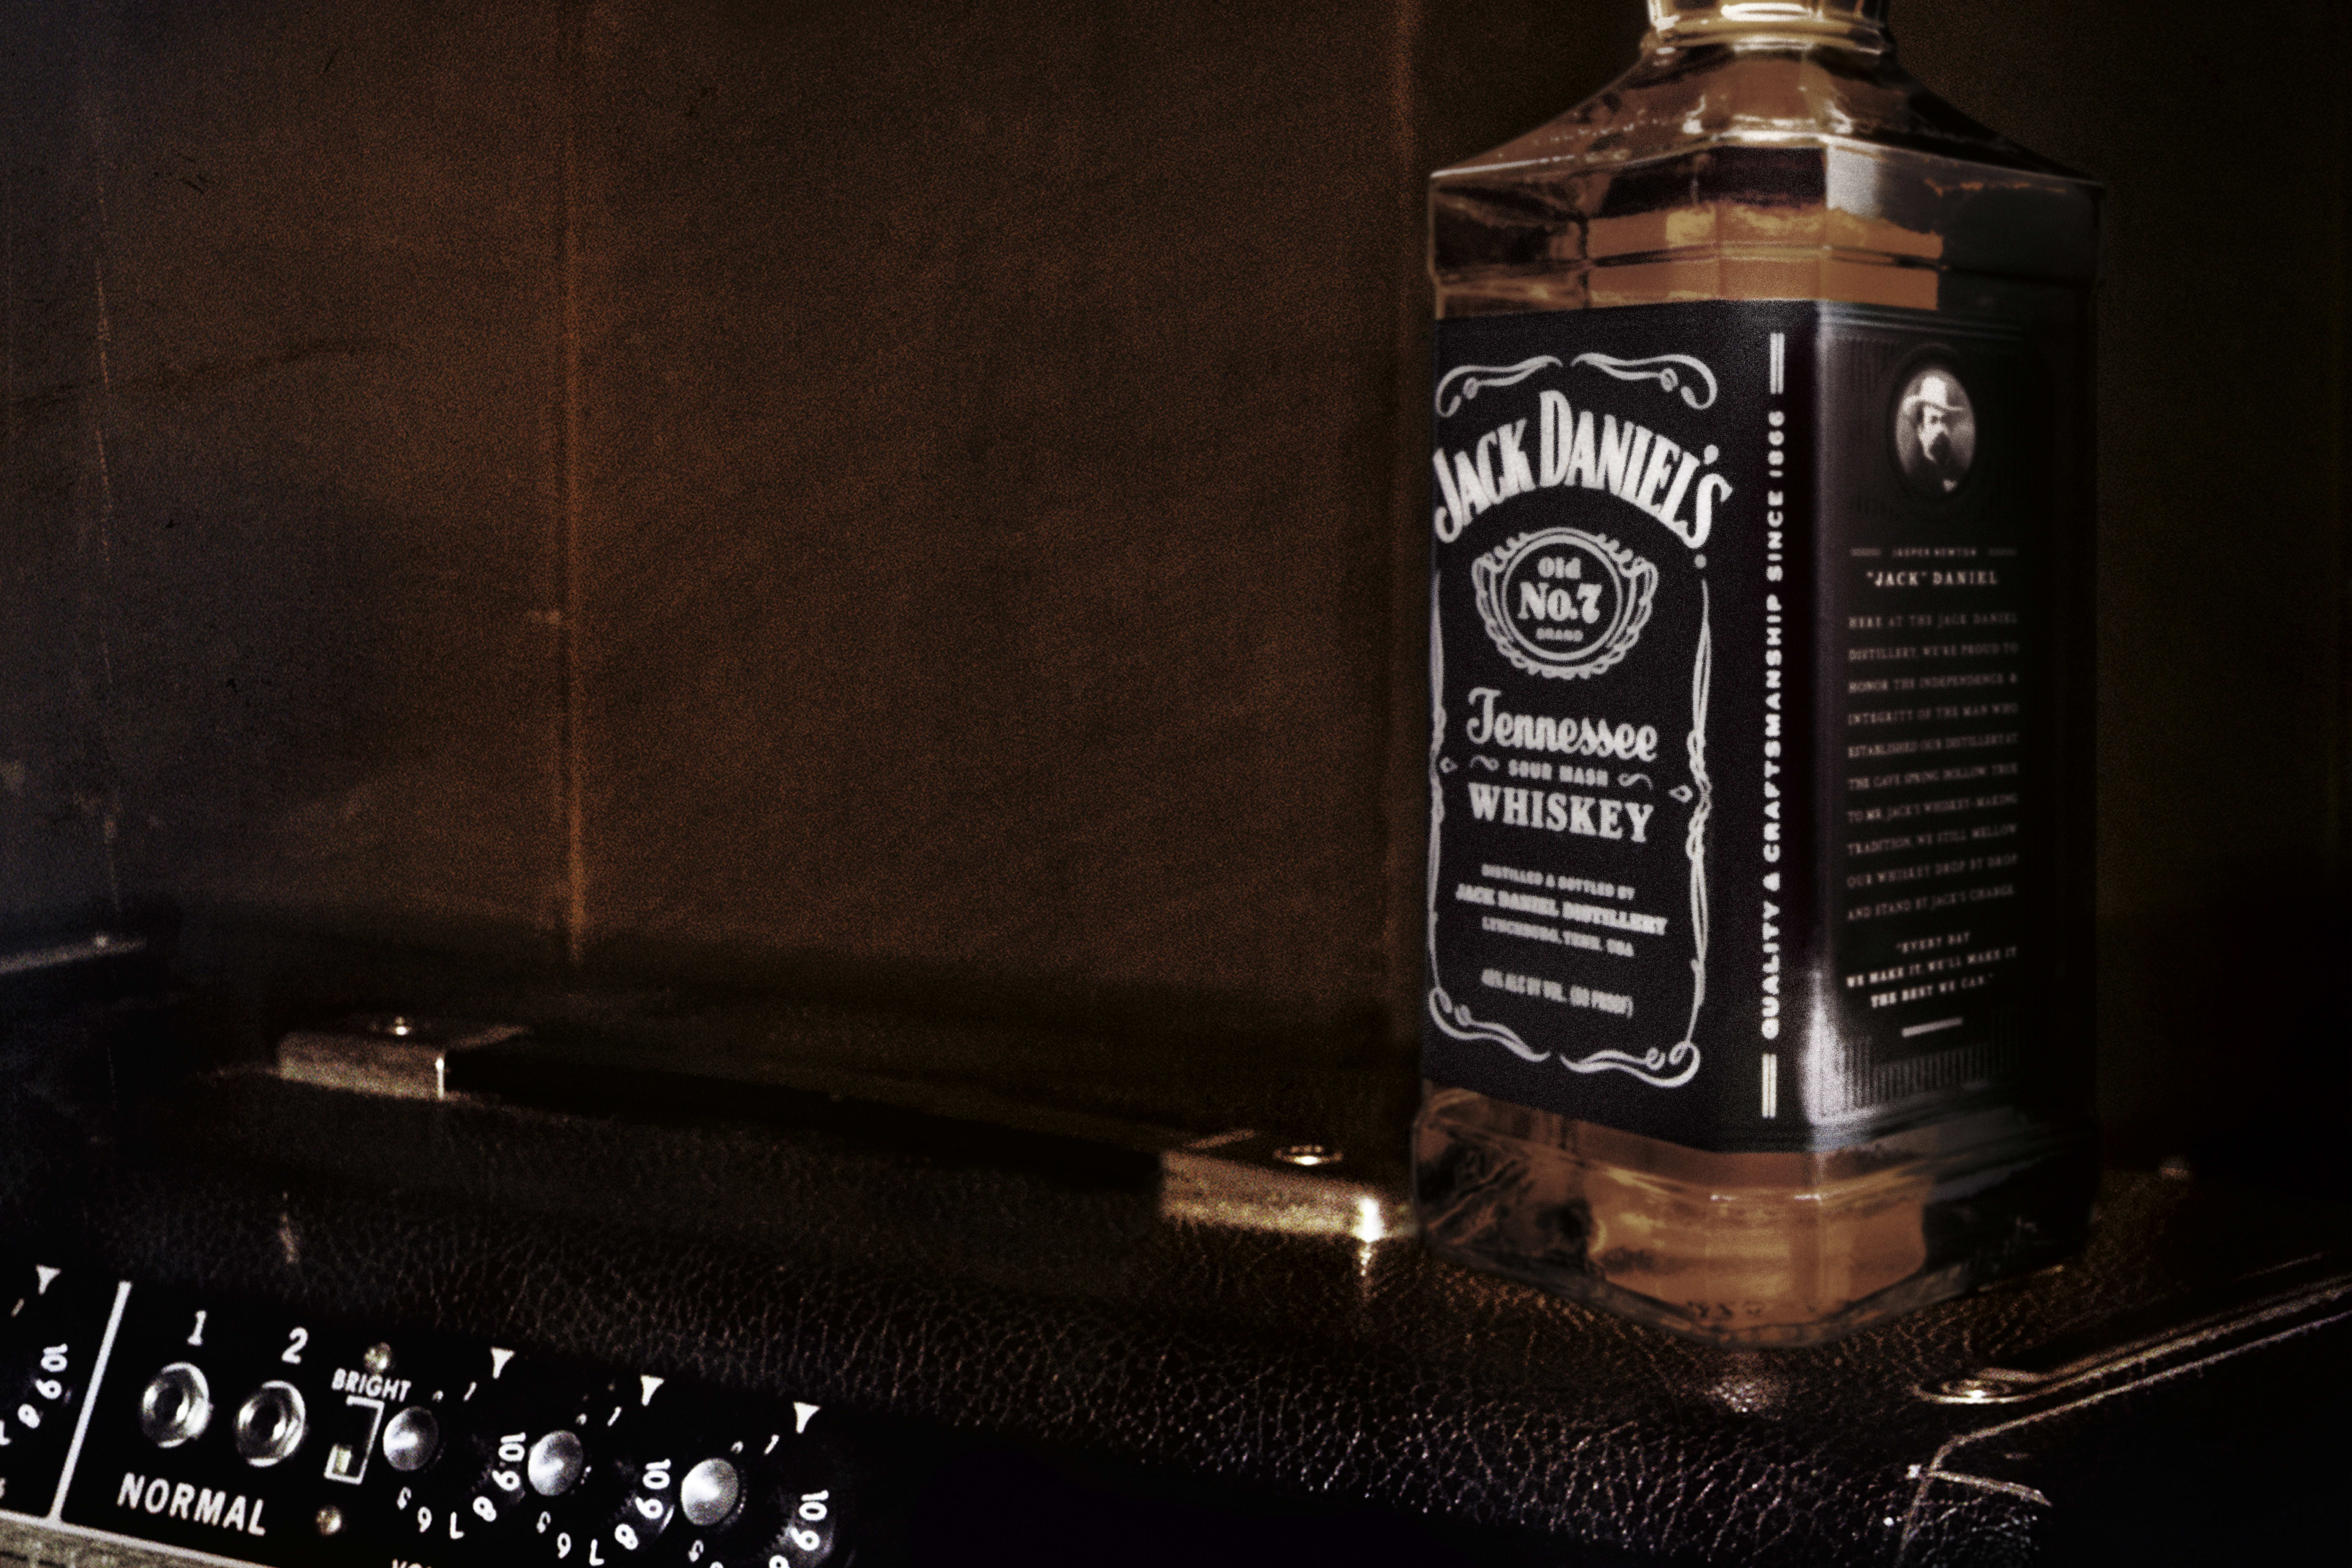 Gana una guitarra eléctrica Jack Daniel's